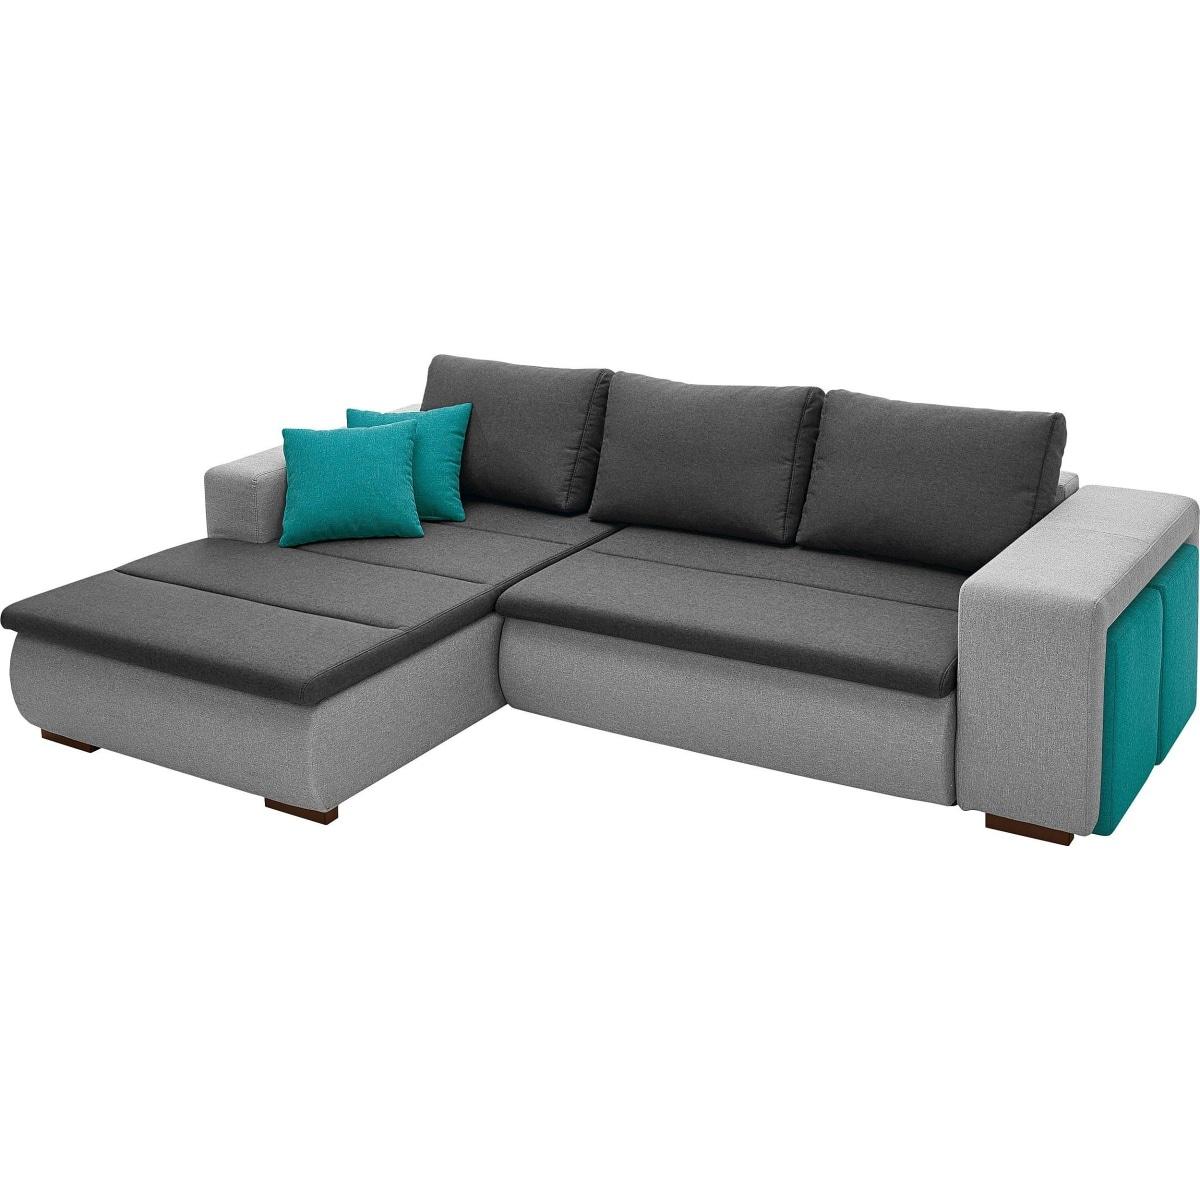 sitzecke grau anthrazit petrol eckgarnituren. Black Bedroom Furniture Sets. Home Design Ideas